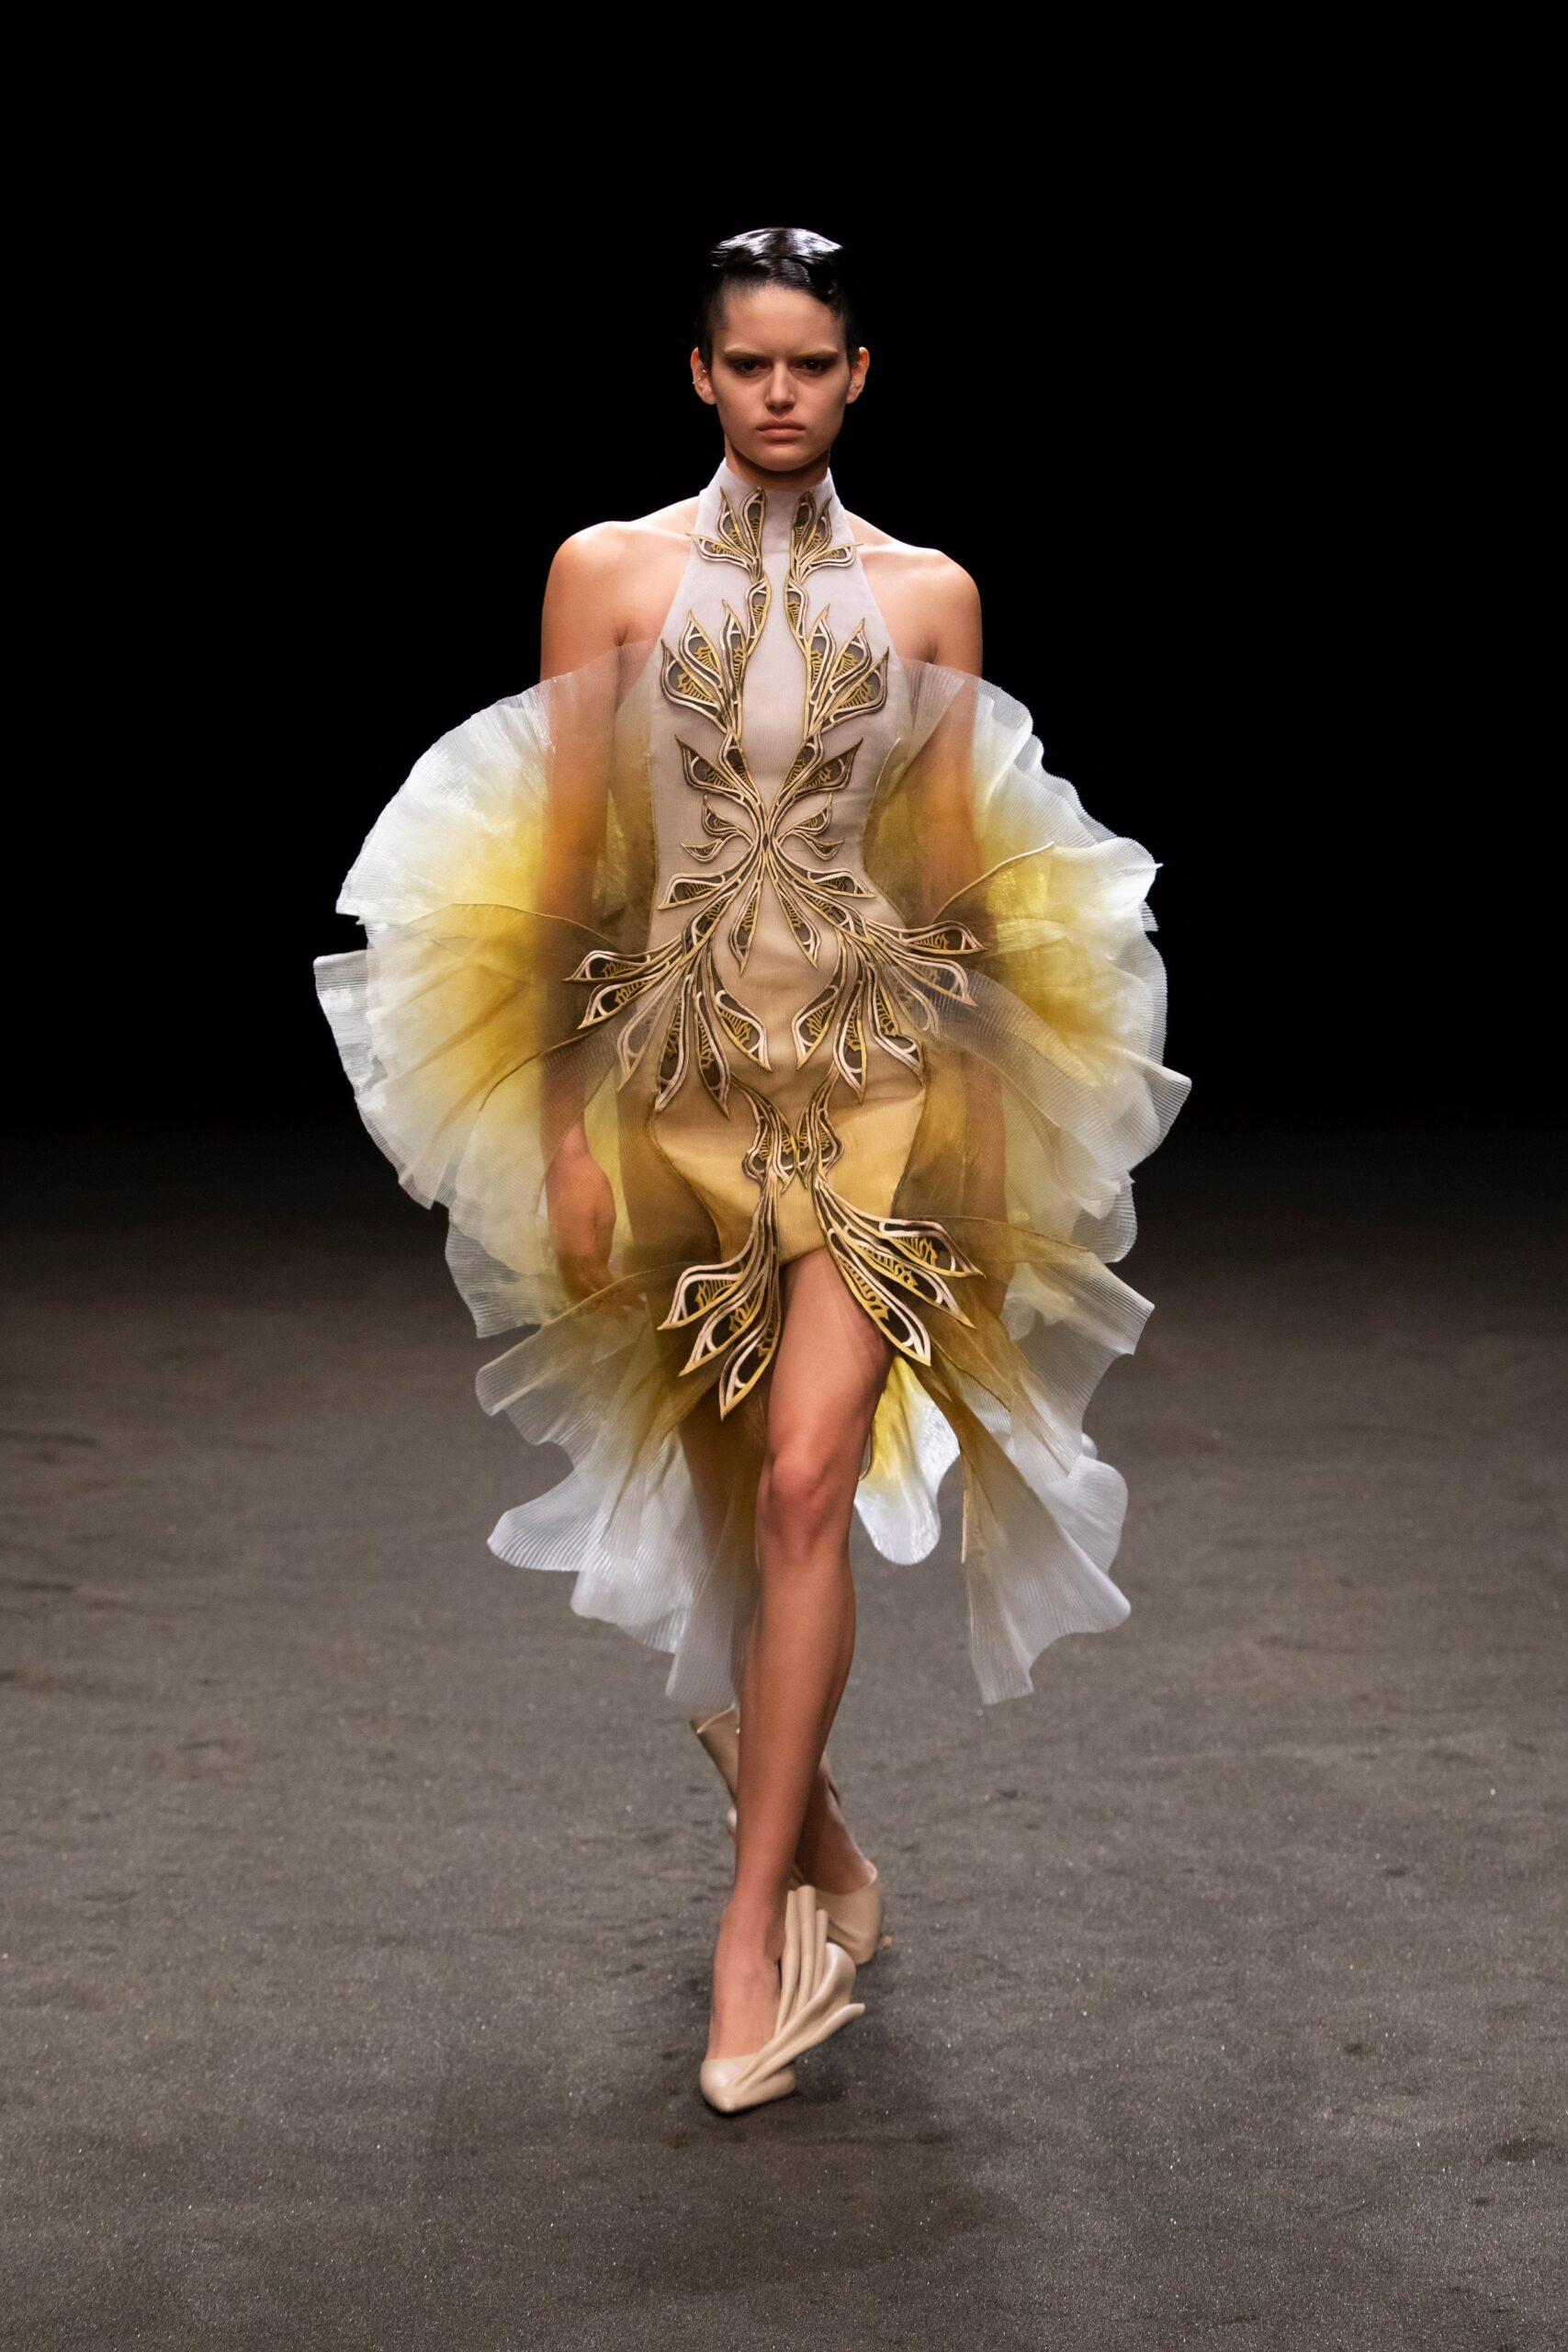 00020 Iris van Herpen Couture Spring 21 credit Gio Staiano